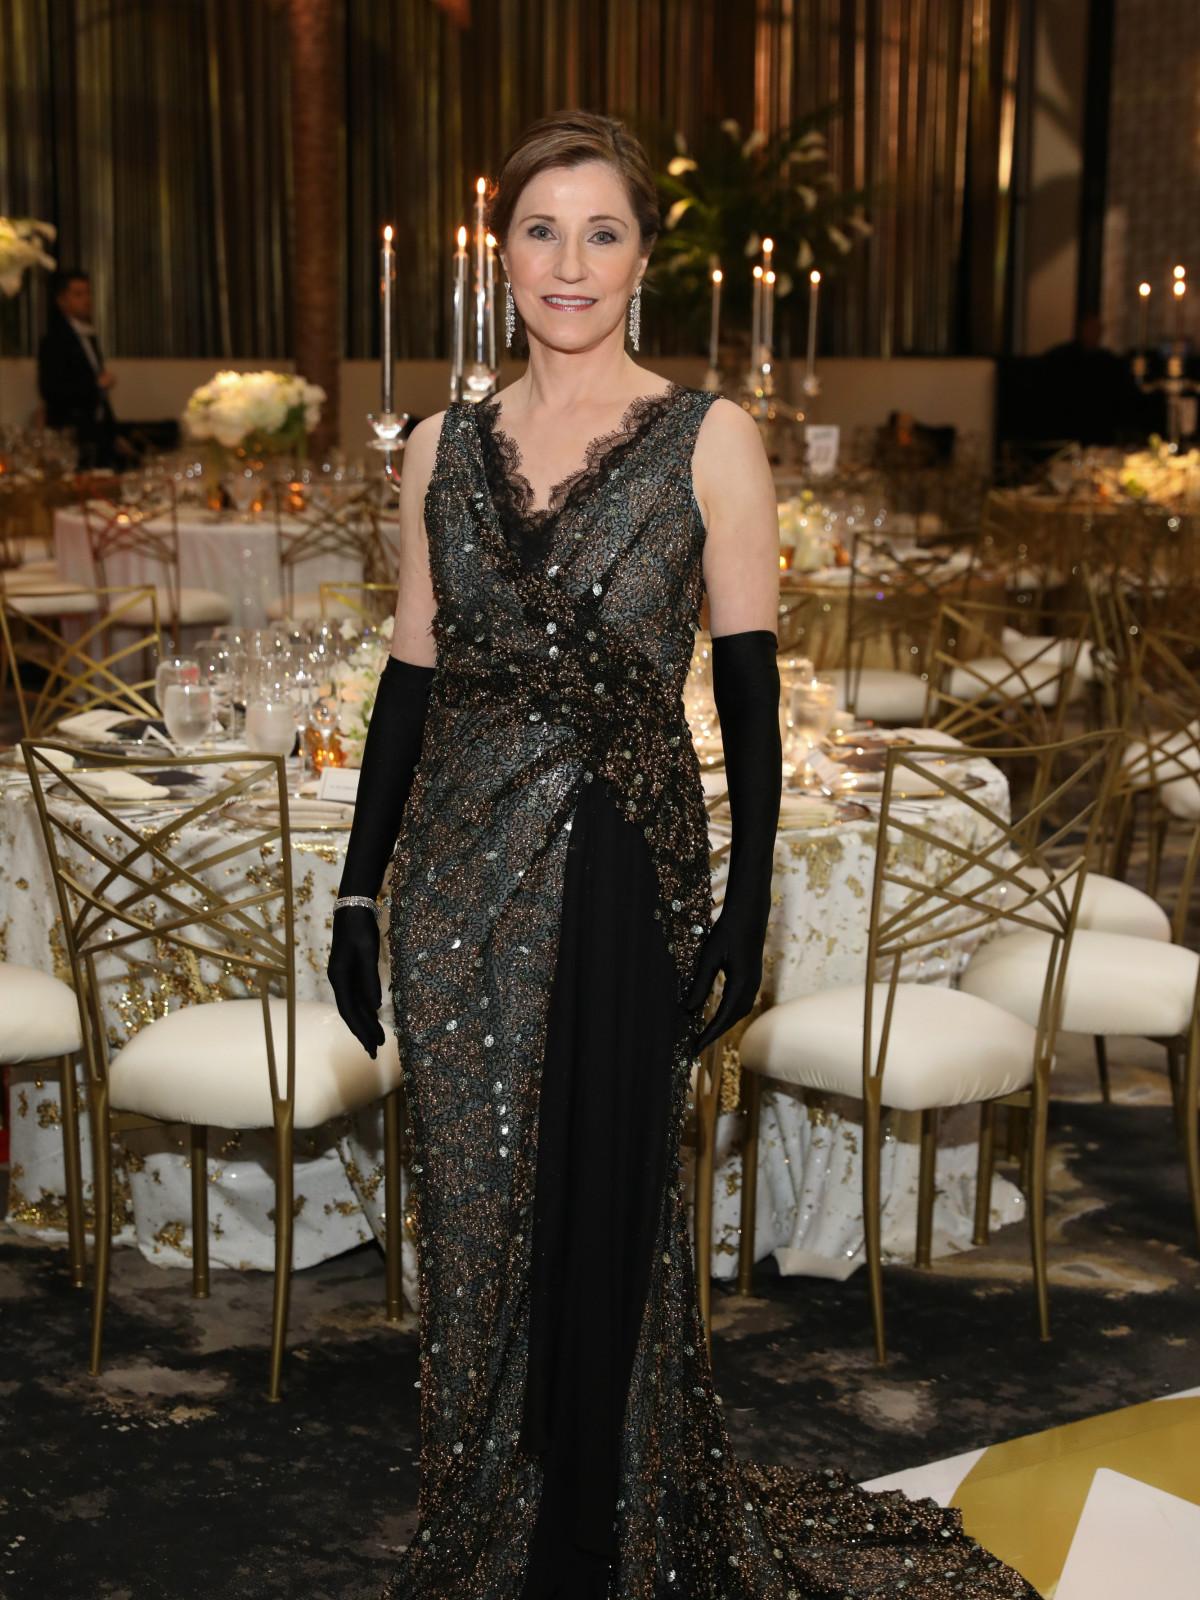 Opera Ball gowns Dr Liz Grimm, Miles David by David Peck